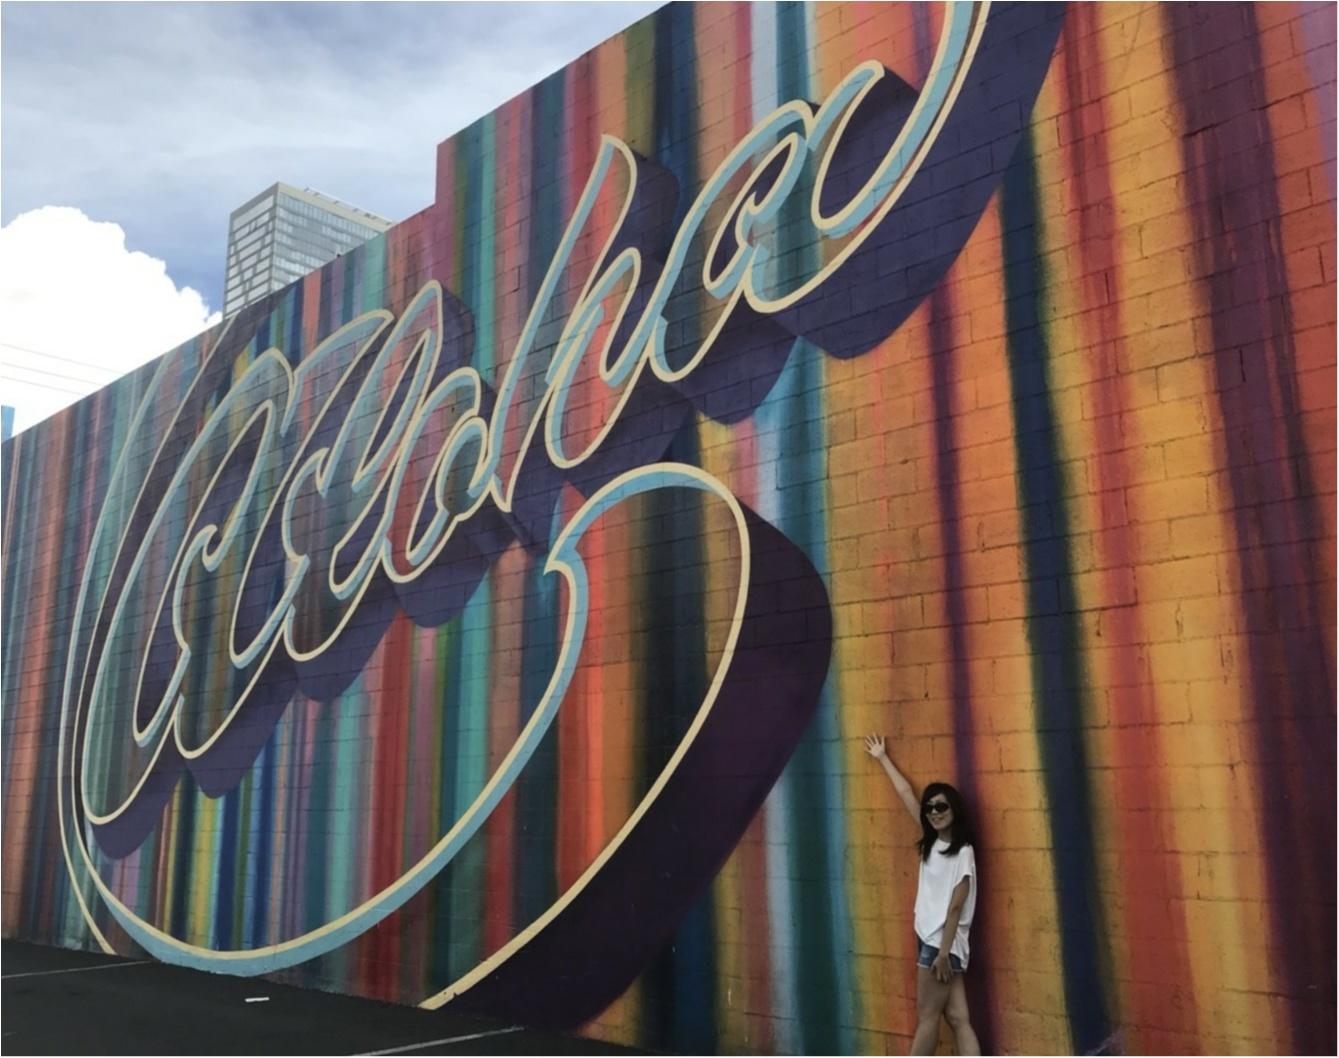 【trip】ハワイで今注目のエリア「カカアコ」でウォールアート巡り♡_5